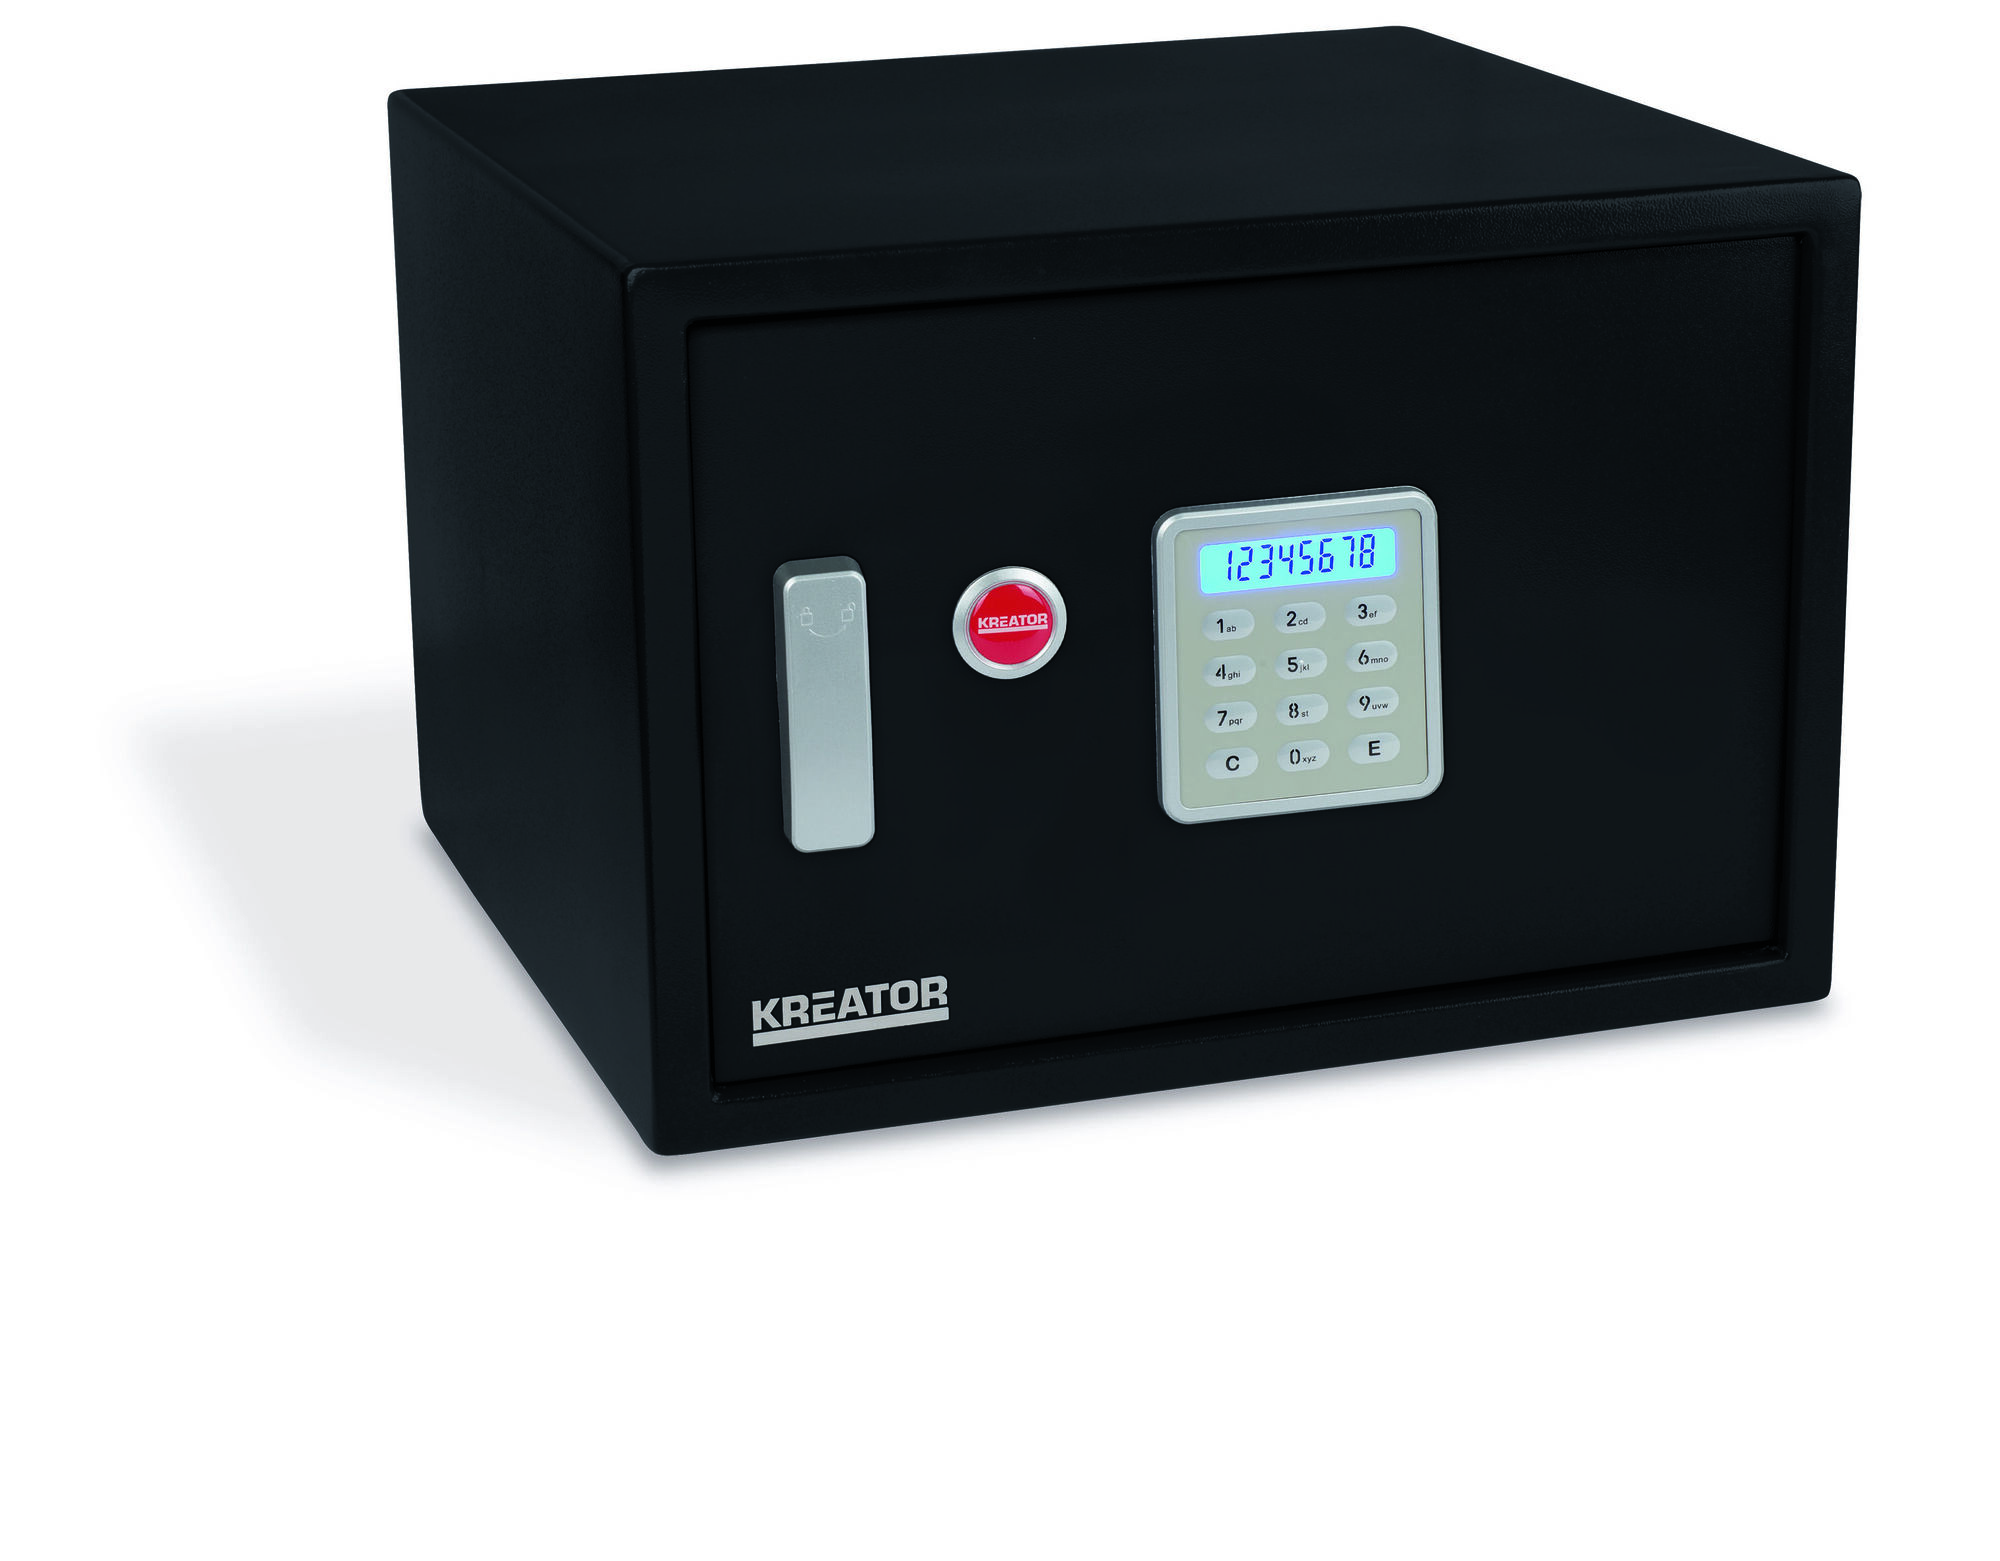 Kreator KRT692015 Elektronische kluis 43,8 x 40 x 30 cm | Laptopkluis hoog model